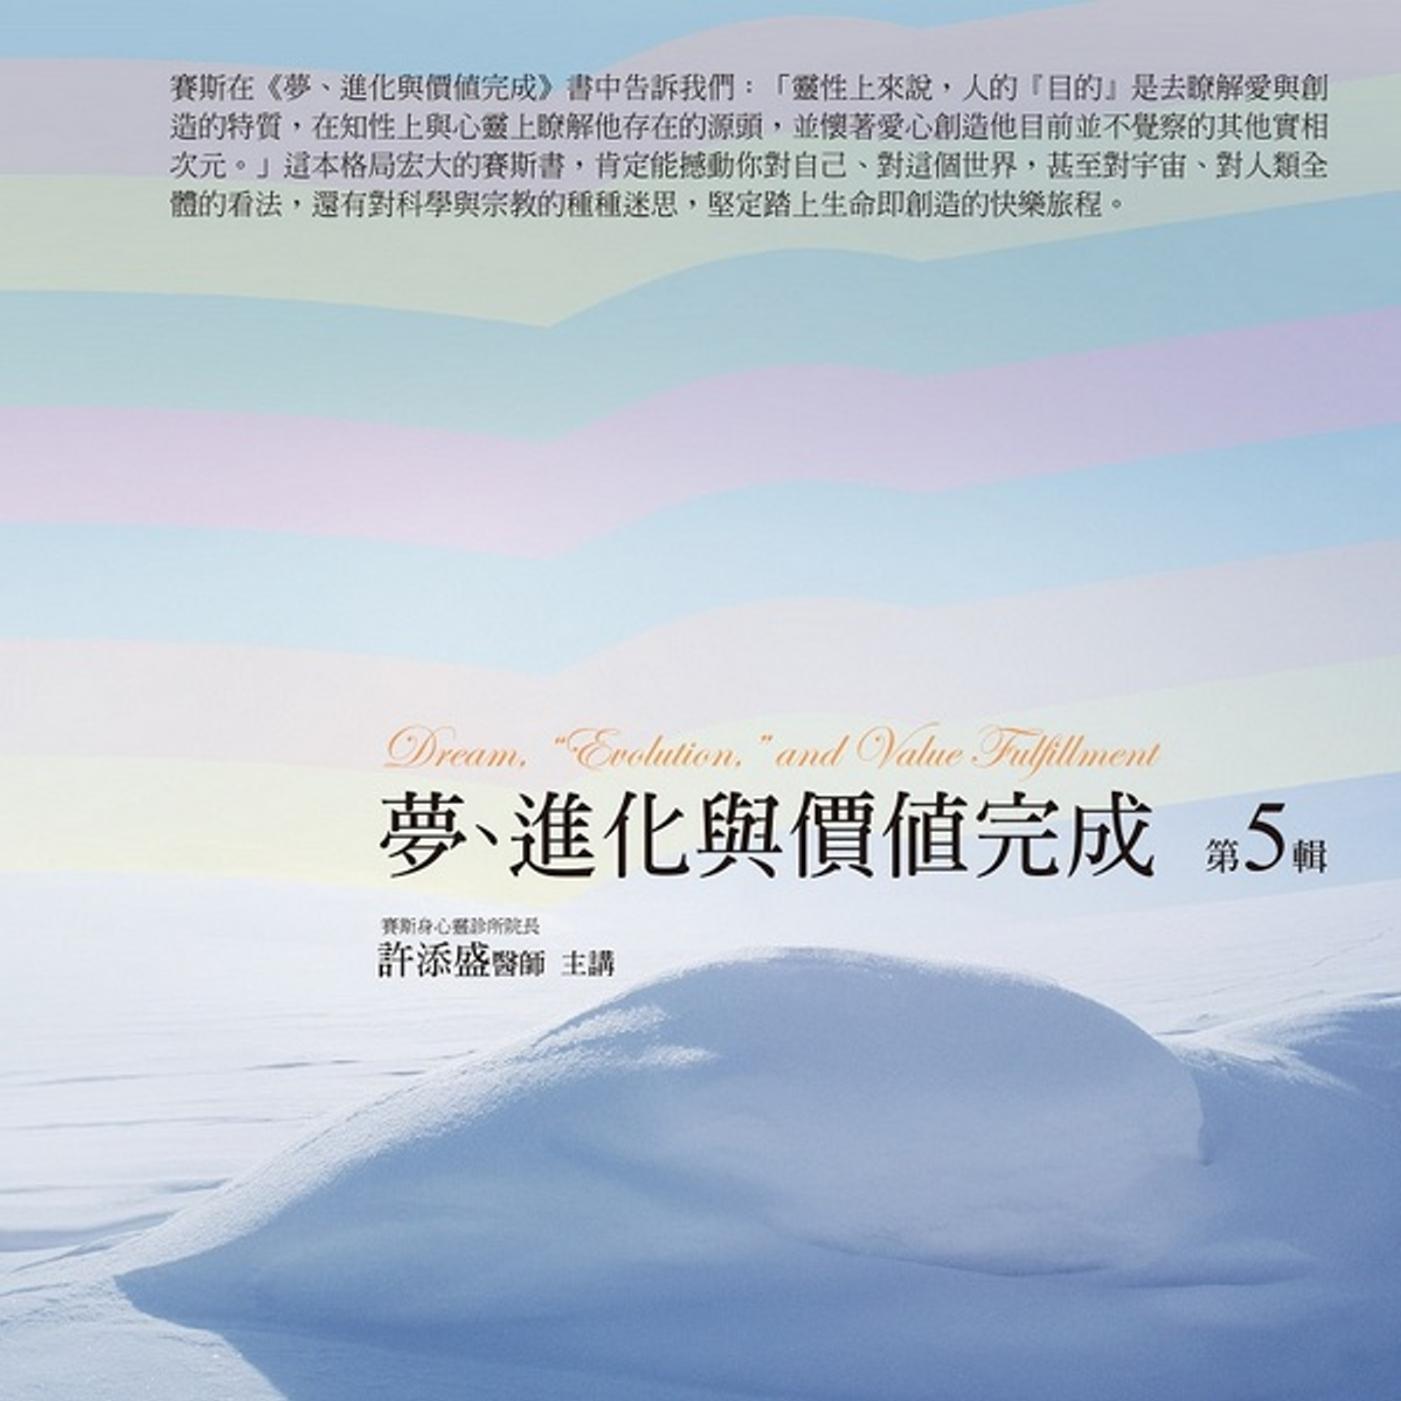 "夢、進化與價值完成有聲書第 5 輯:Dream,""Evolution,""and Value Fulfillment"